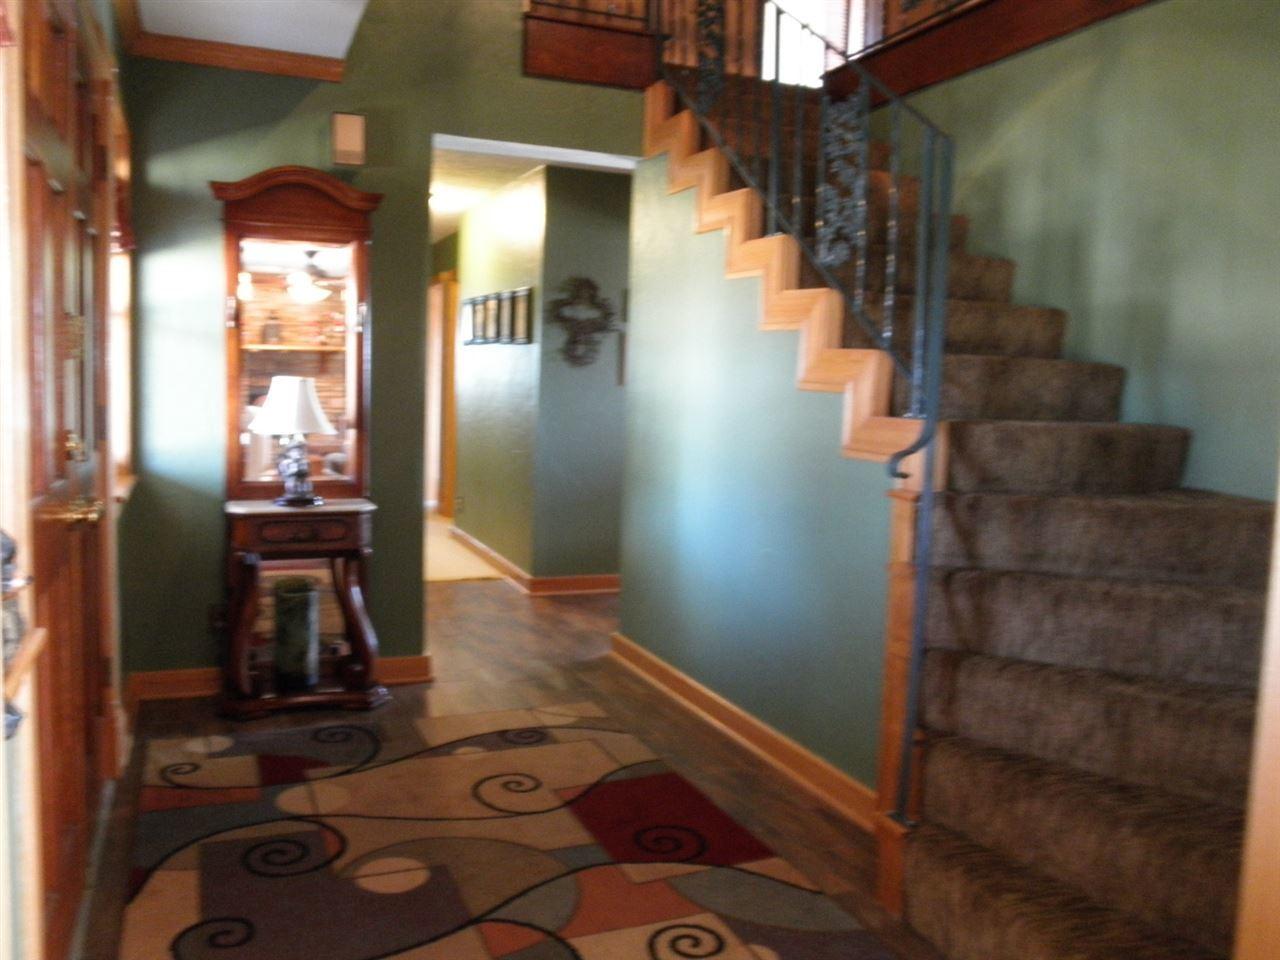 Sold Intraoffice W/MLS | 7038 River Ridge Drive  Ponca City, OK 74604 4